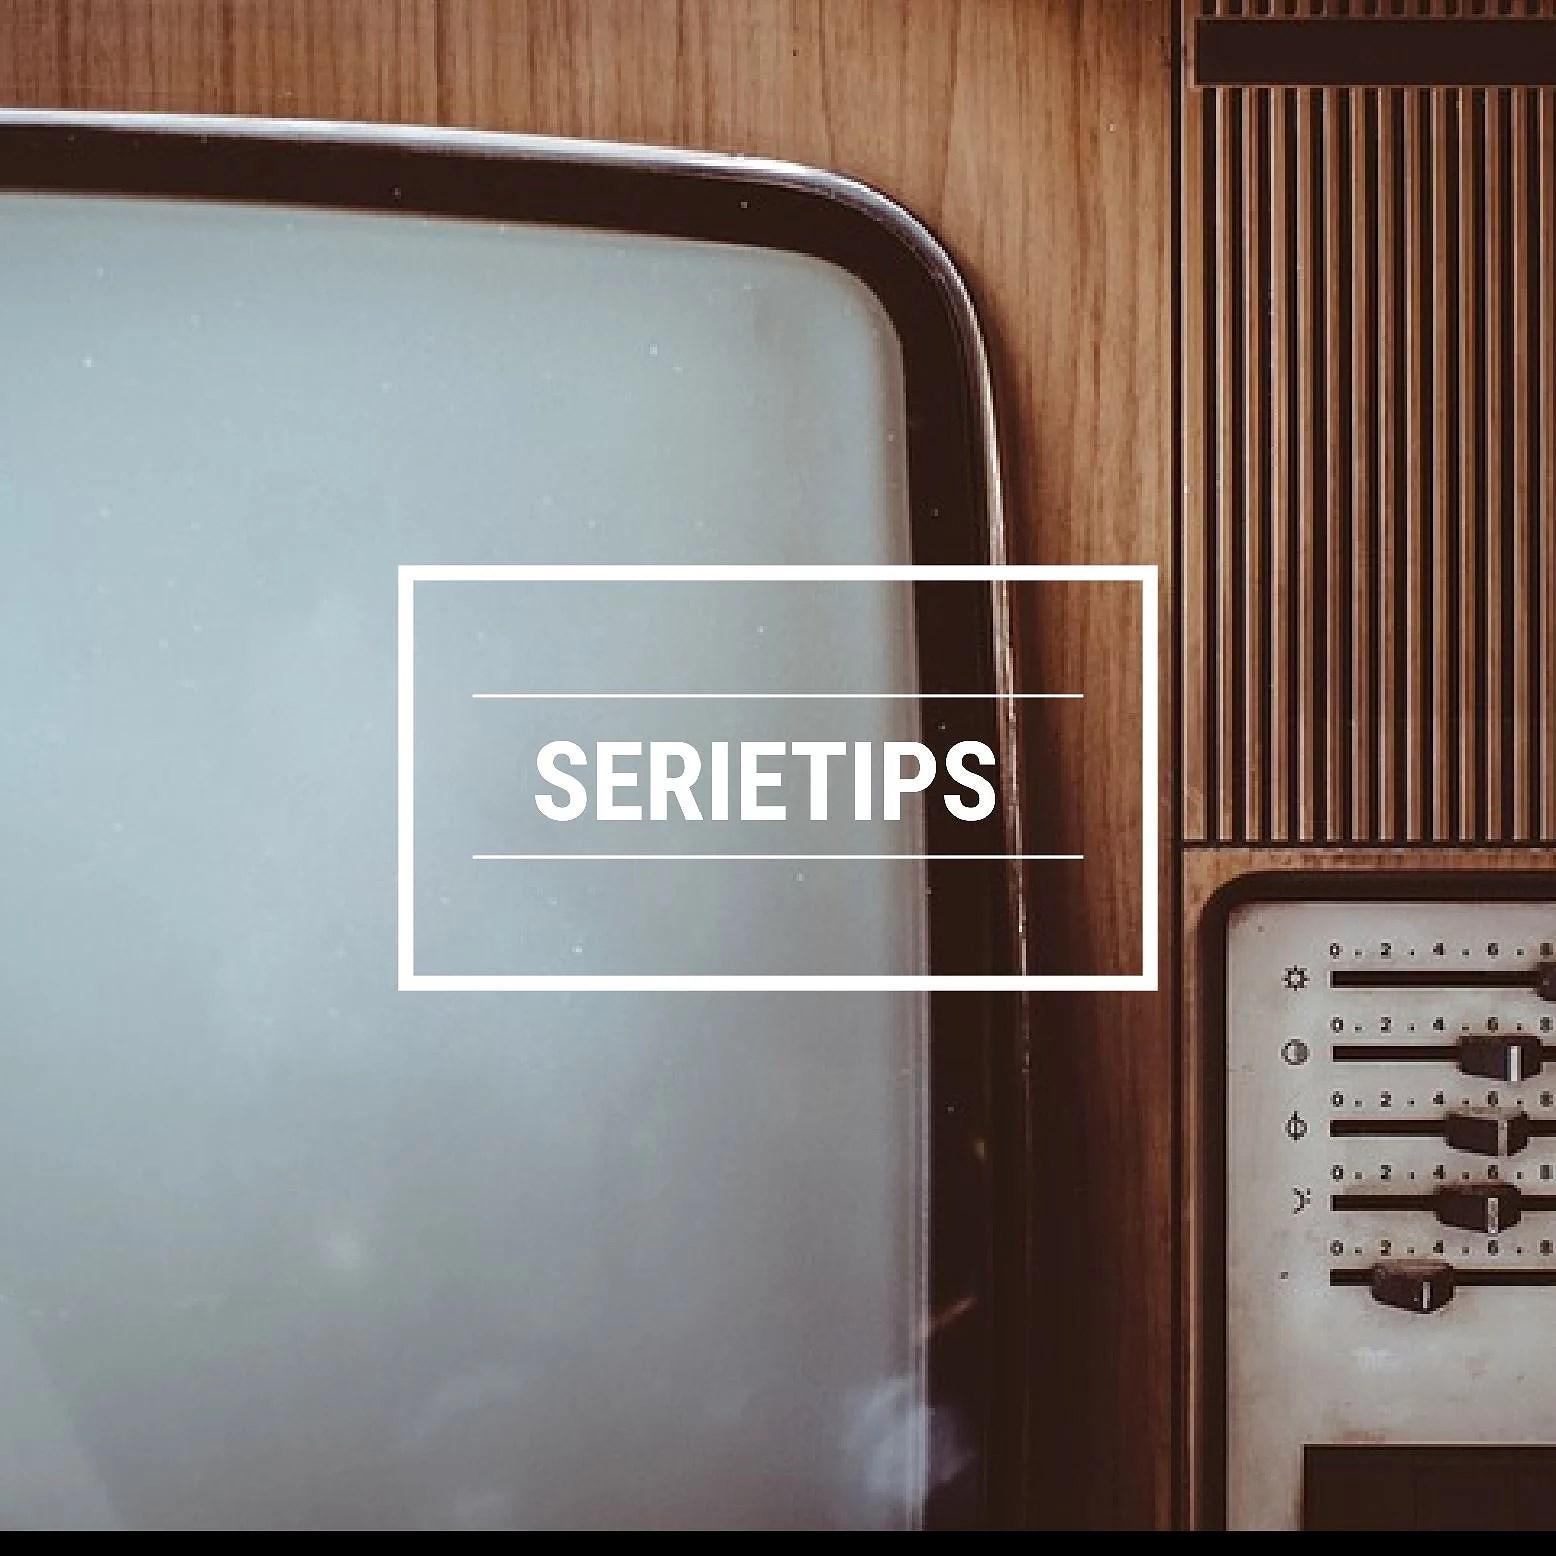 Serietips - Sweetbitter